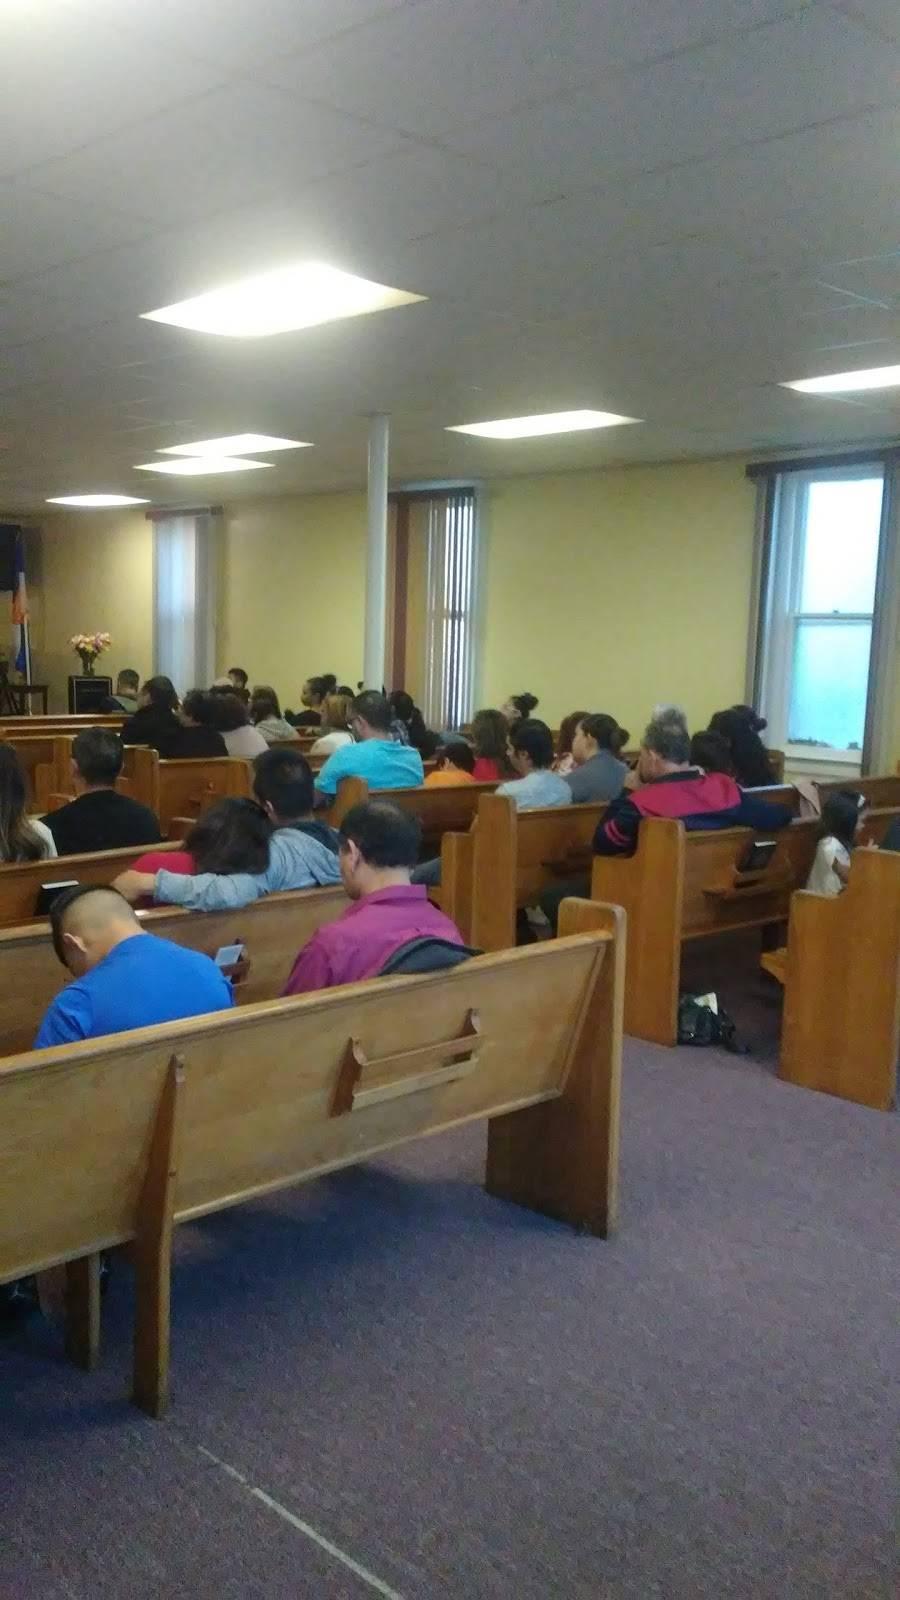 Detroit Cavalry Spanish SDA Church - church  | Photo 6 of 10 | Address: 1227 Cavalry St, Detroit, MI 48209, USA | Phone: (313) 842-2730